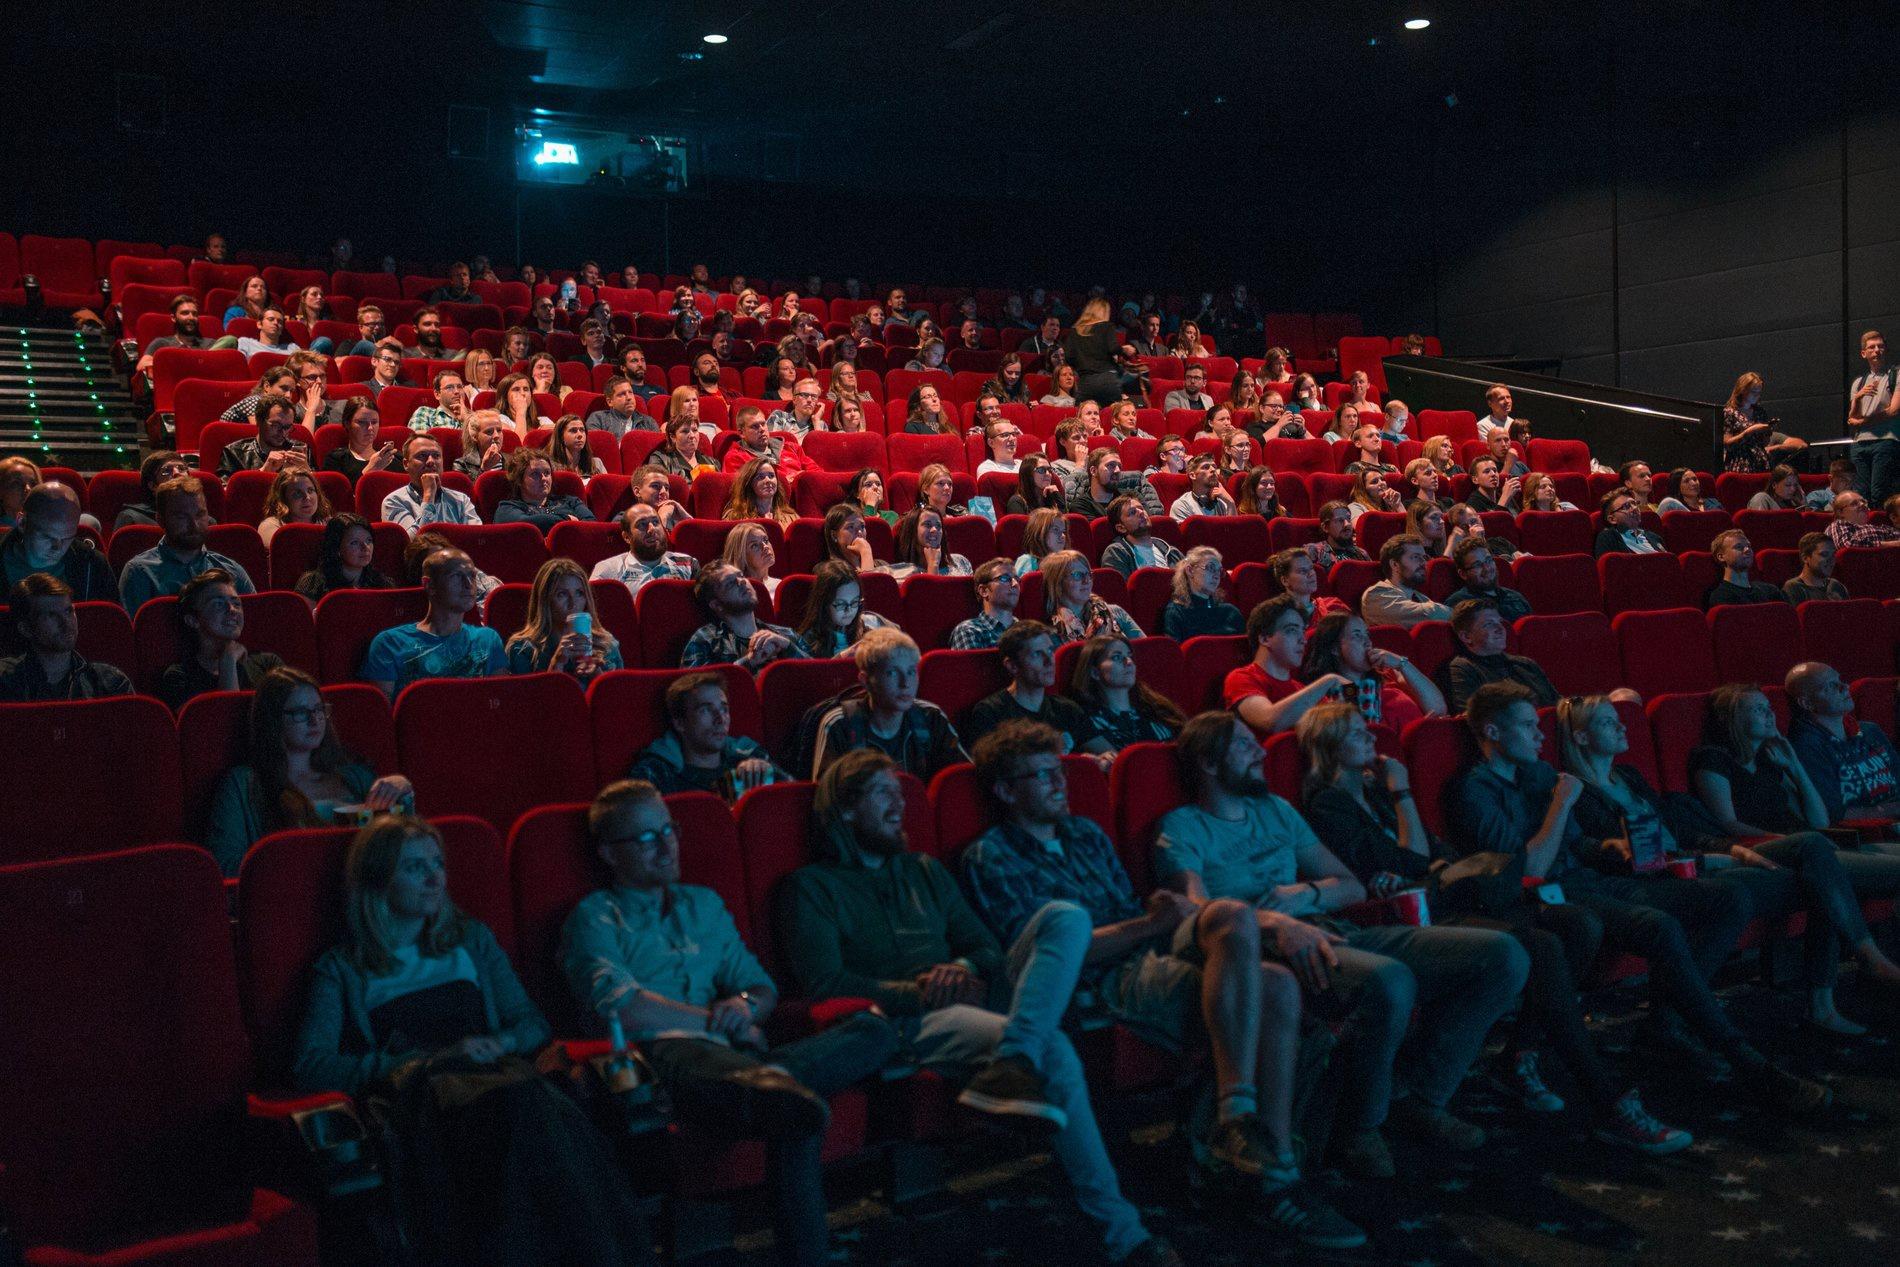 4 Simple Steps for Finding Film Festivals